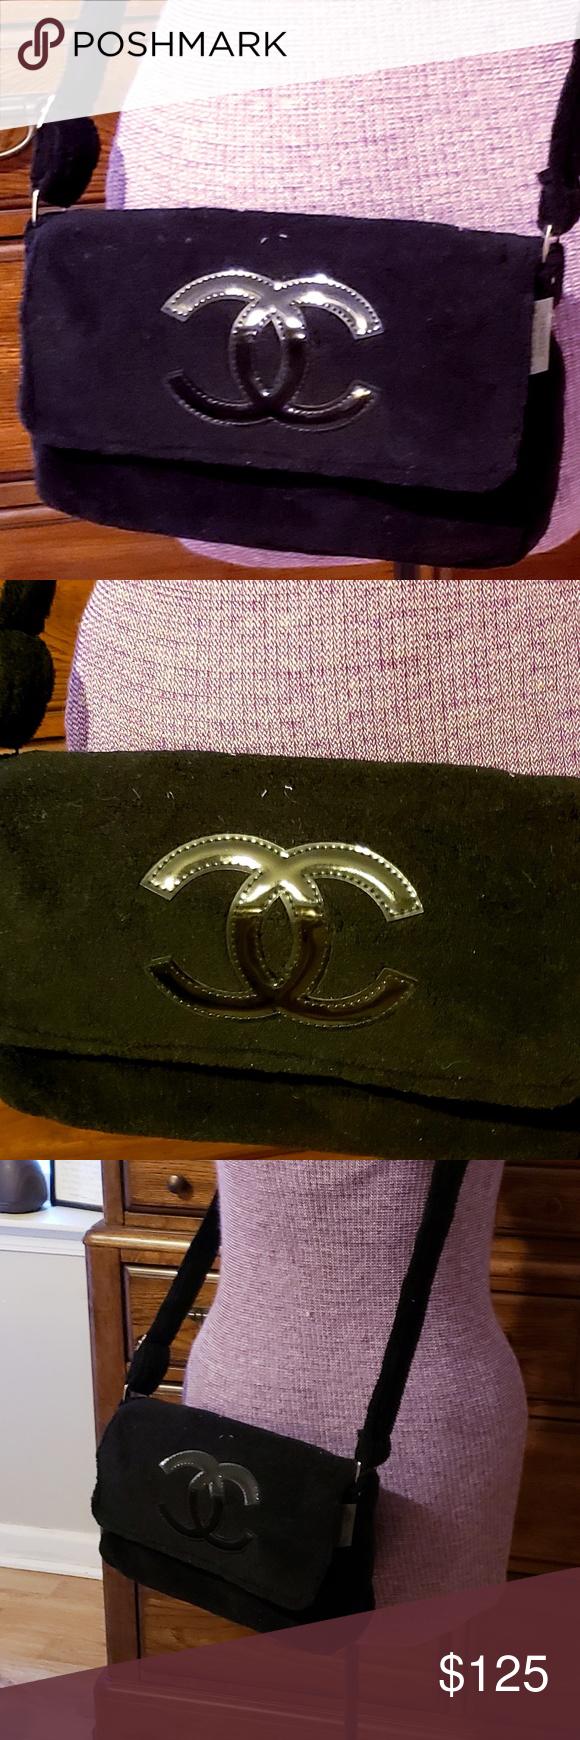 d823df18f12f Chanel Precision VIP Cross-Body Shoulder Bag Brand New Authentic CHANEL  Precision VIP Gift Black